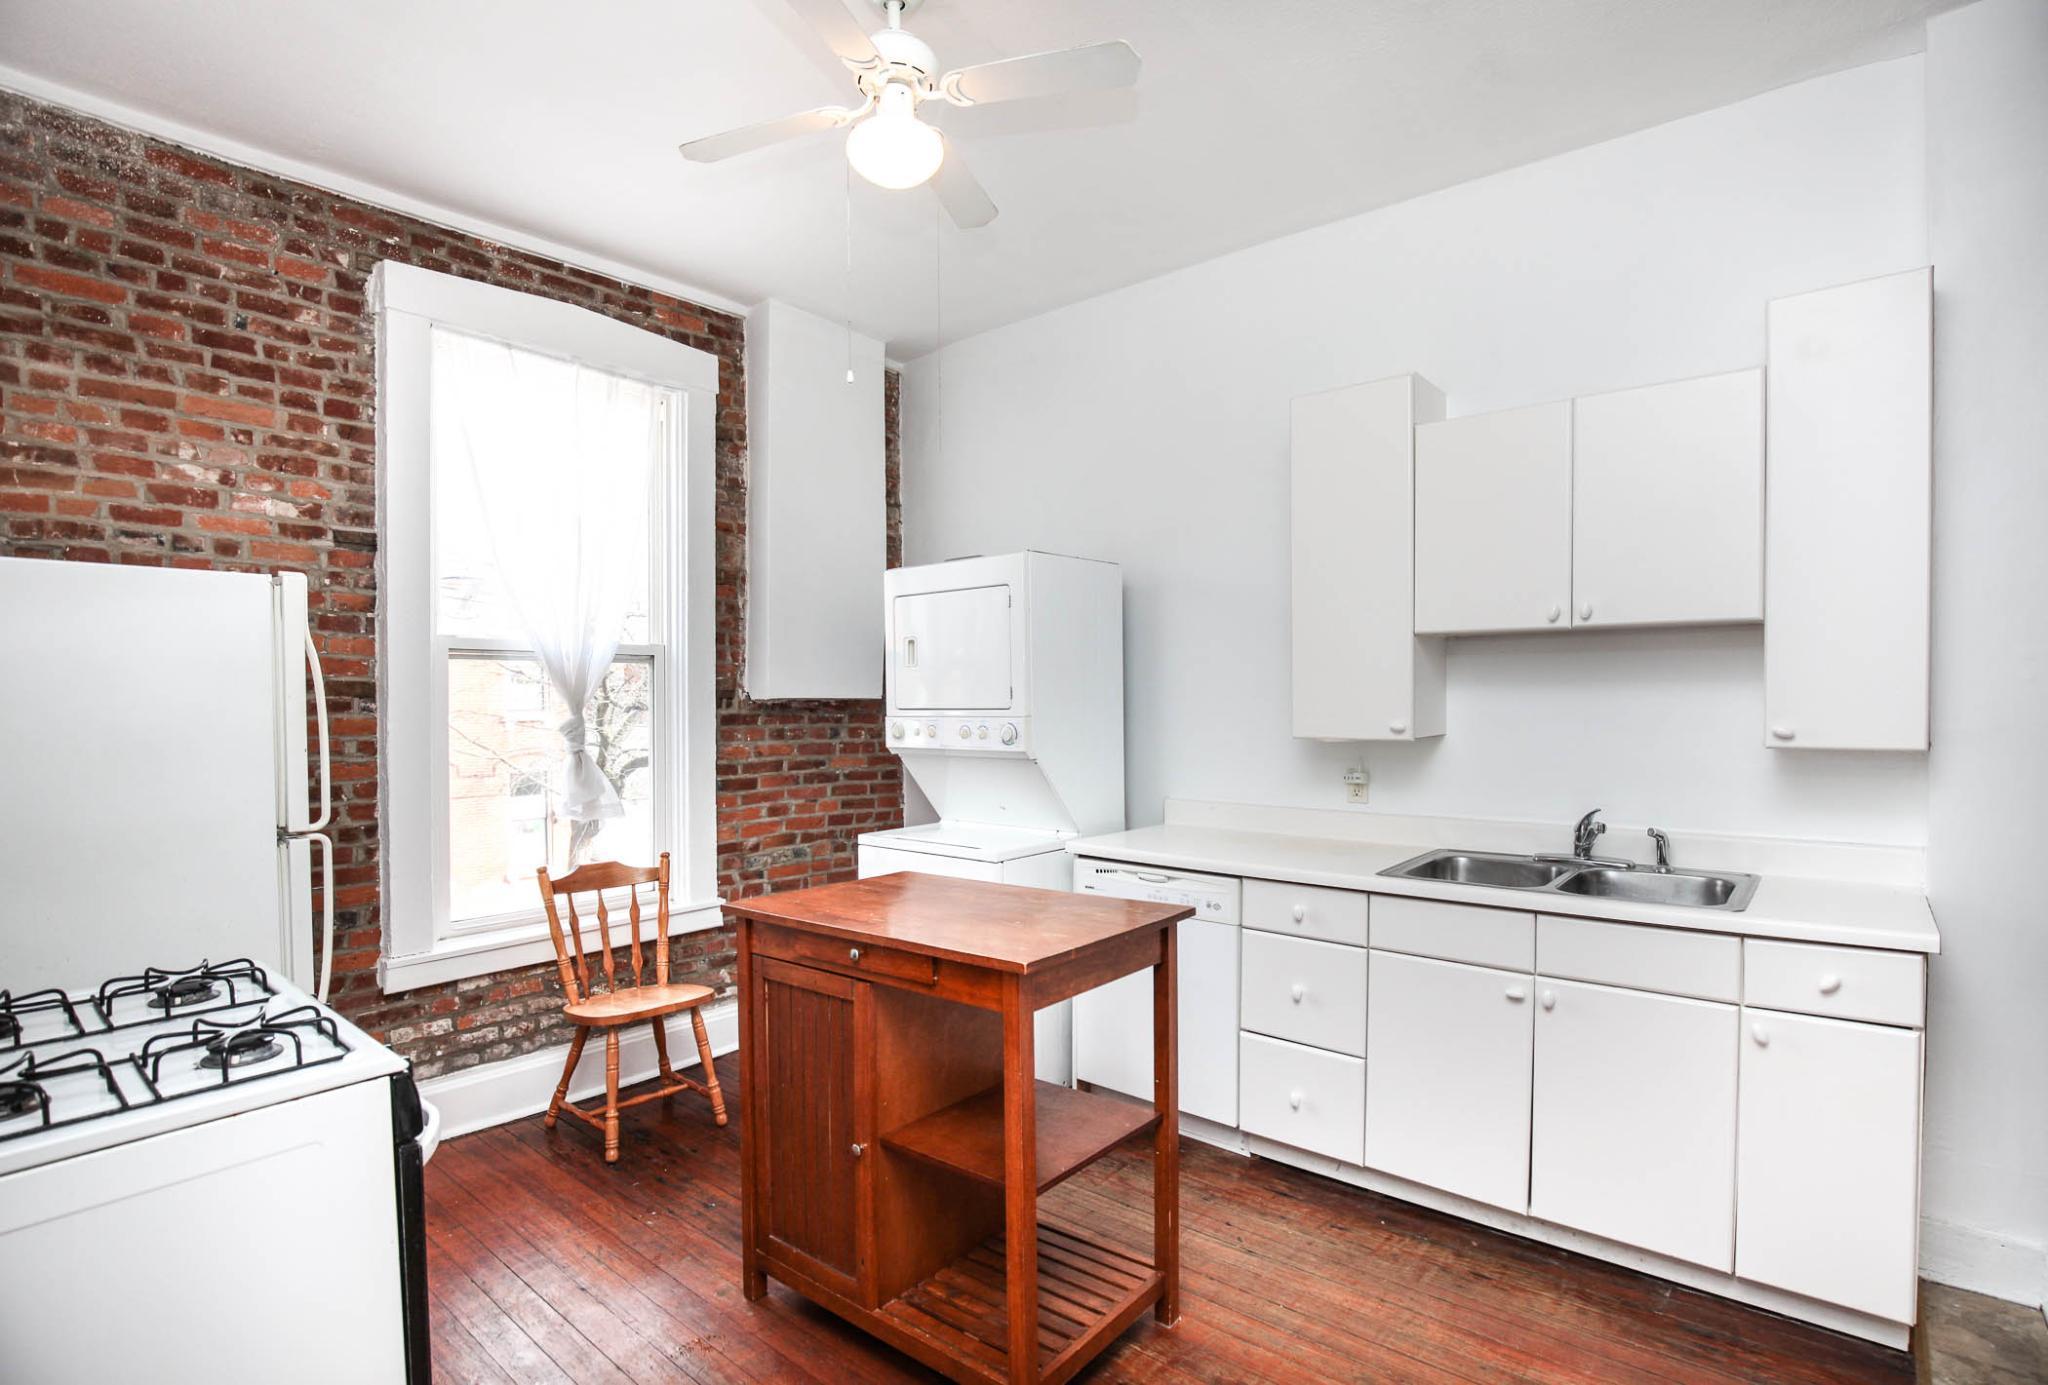 2300 S 11th St #REAR For Rent - Saint Louis, MO | Trulia